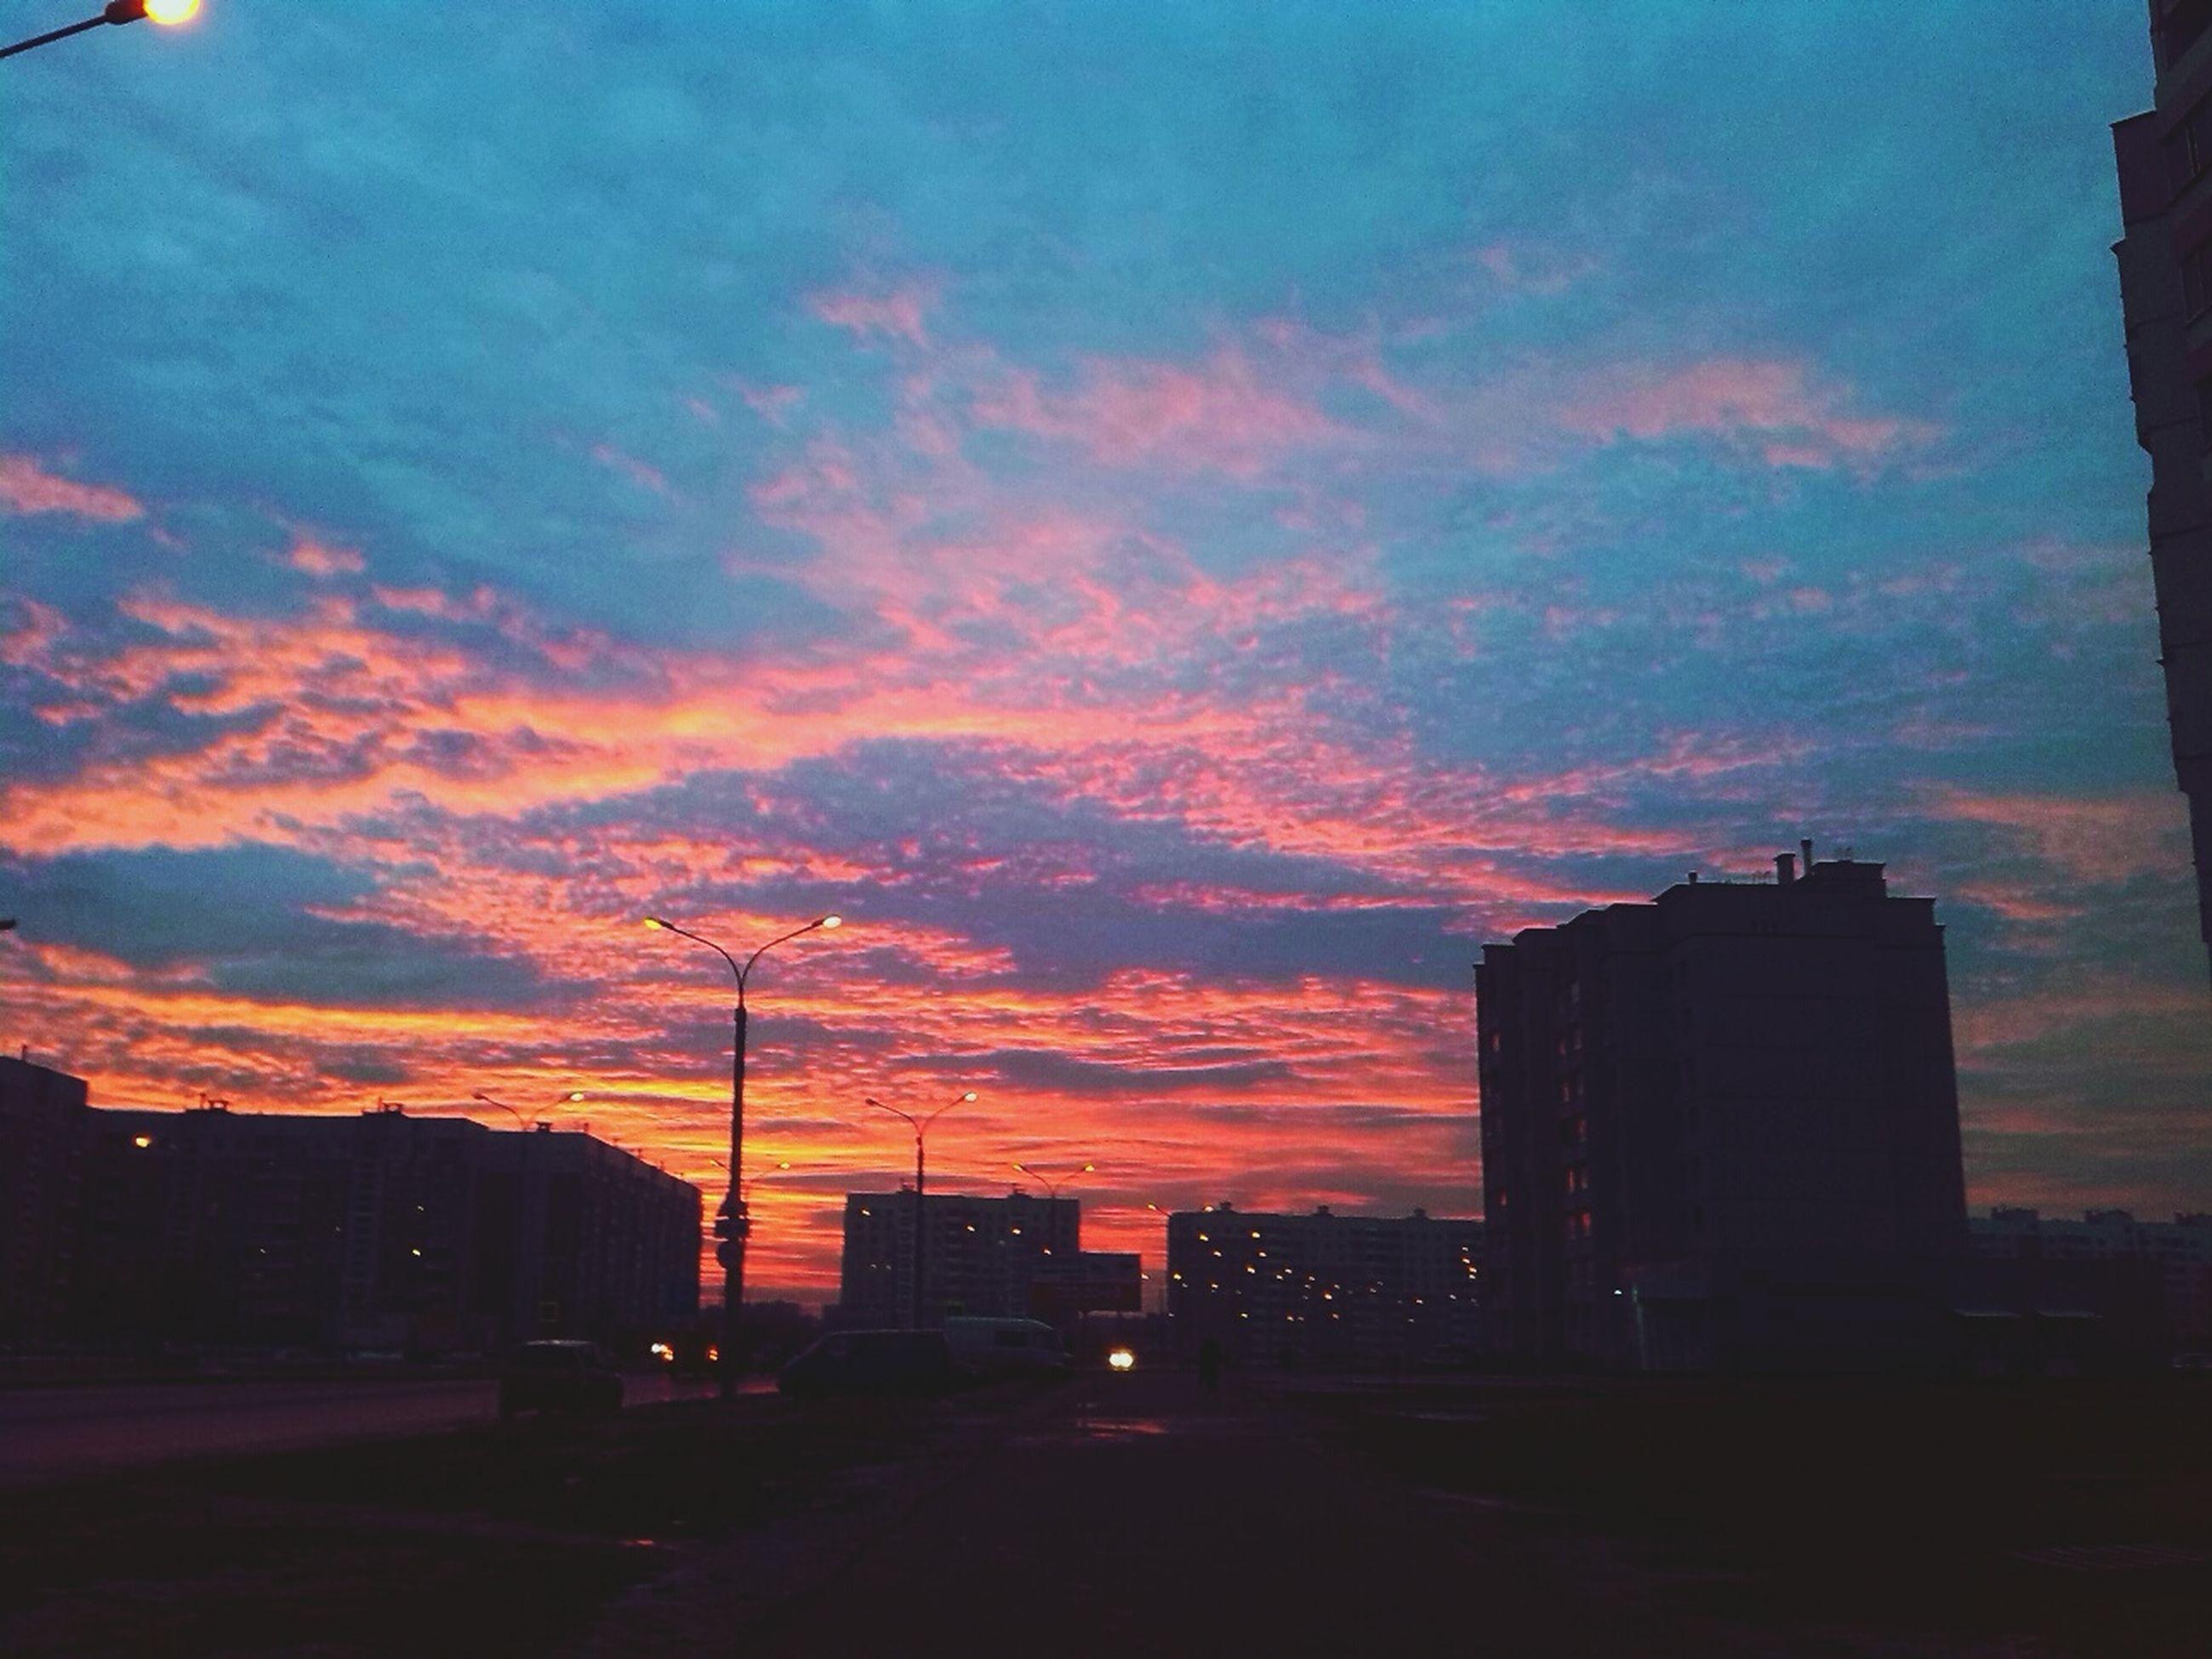 sunset, building exterior, architecture, built structure, silhouette, sky, orange color, city, cloud - sky, road, street, car, transportation, cloud, dramatic sky, dusk, street light, outdoors, building, no people